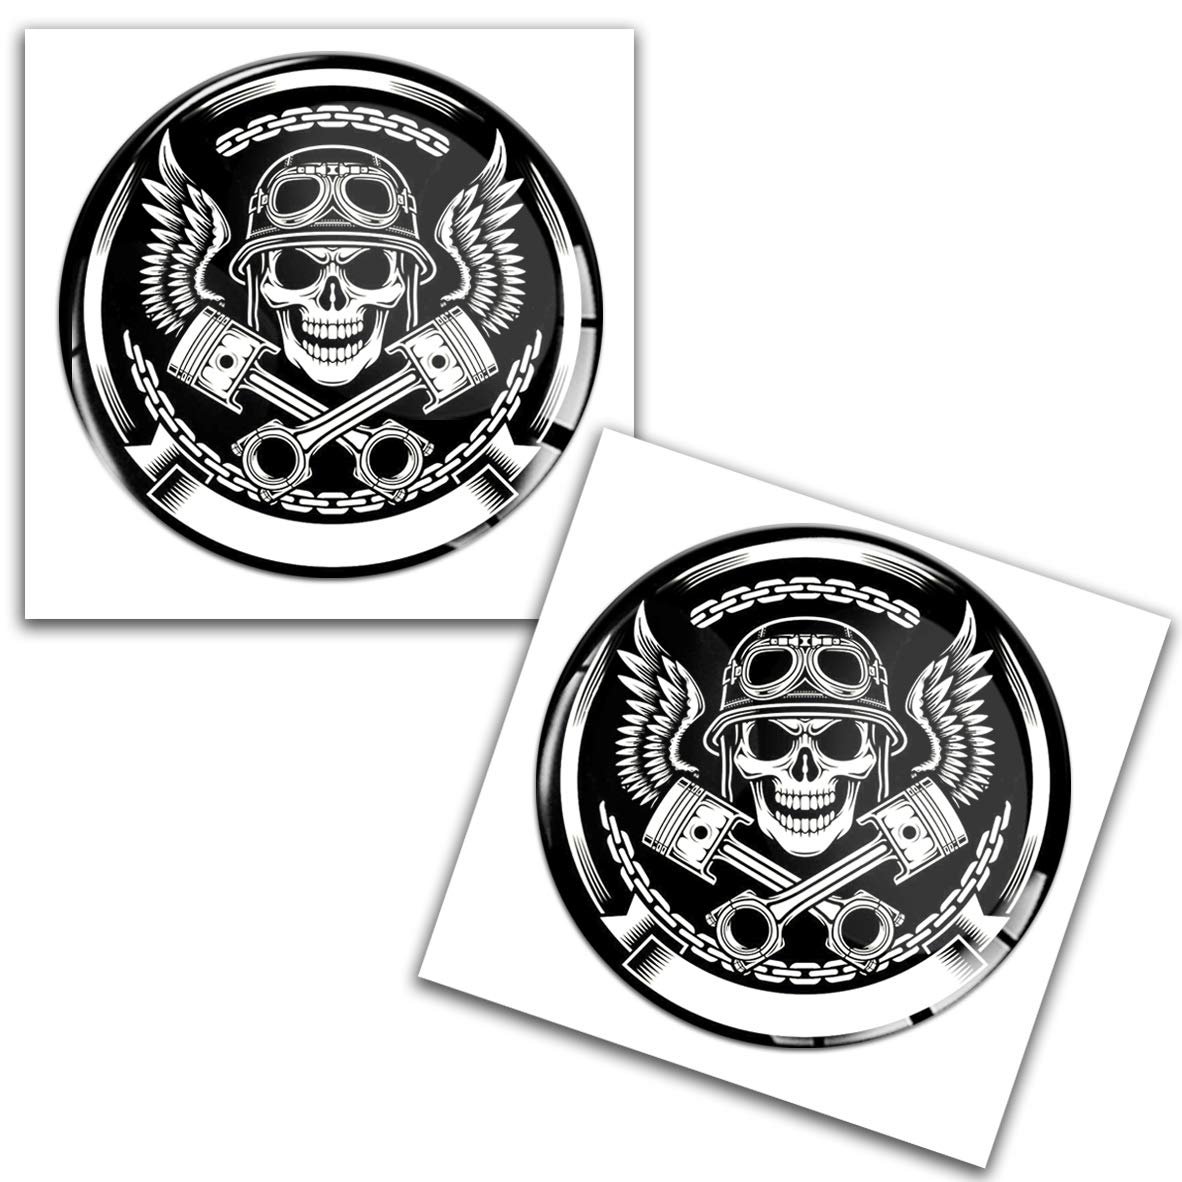 SkinoEu/® 2 x Adesivi Resinati 3D Gel Stickers Teschio Cranio Skull per Moto Motociclo Auto Finestr/ìno Porta Casco Scooter Skateboard Bici PC Laptop Tablet Tuning JDM KS 4